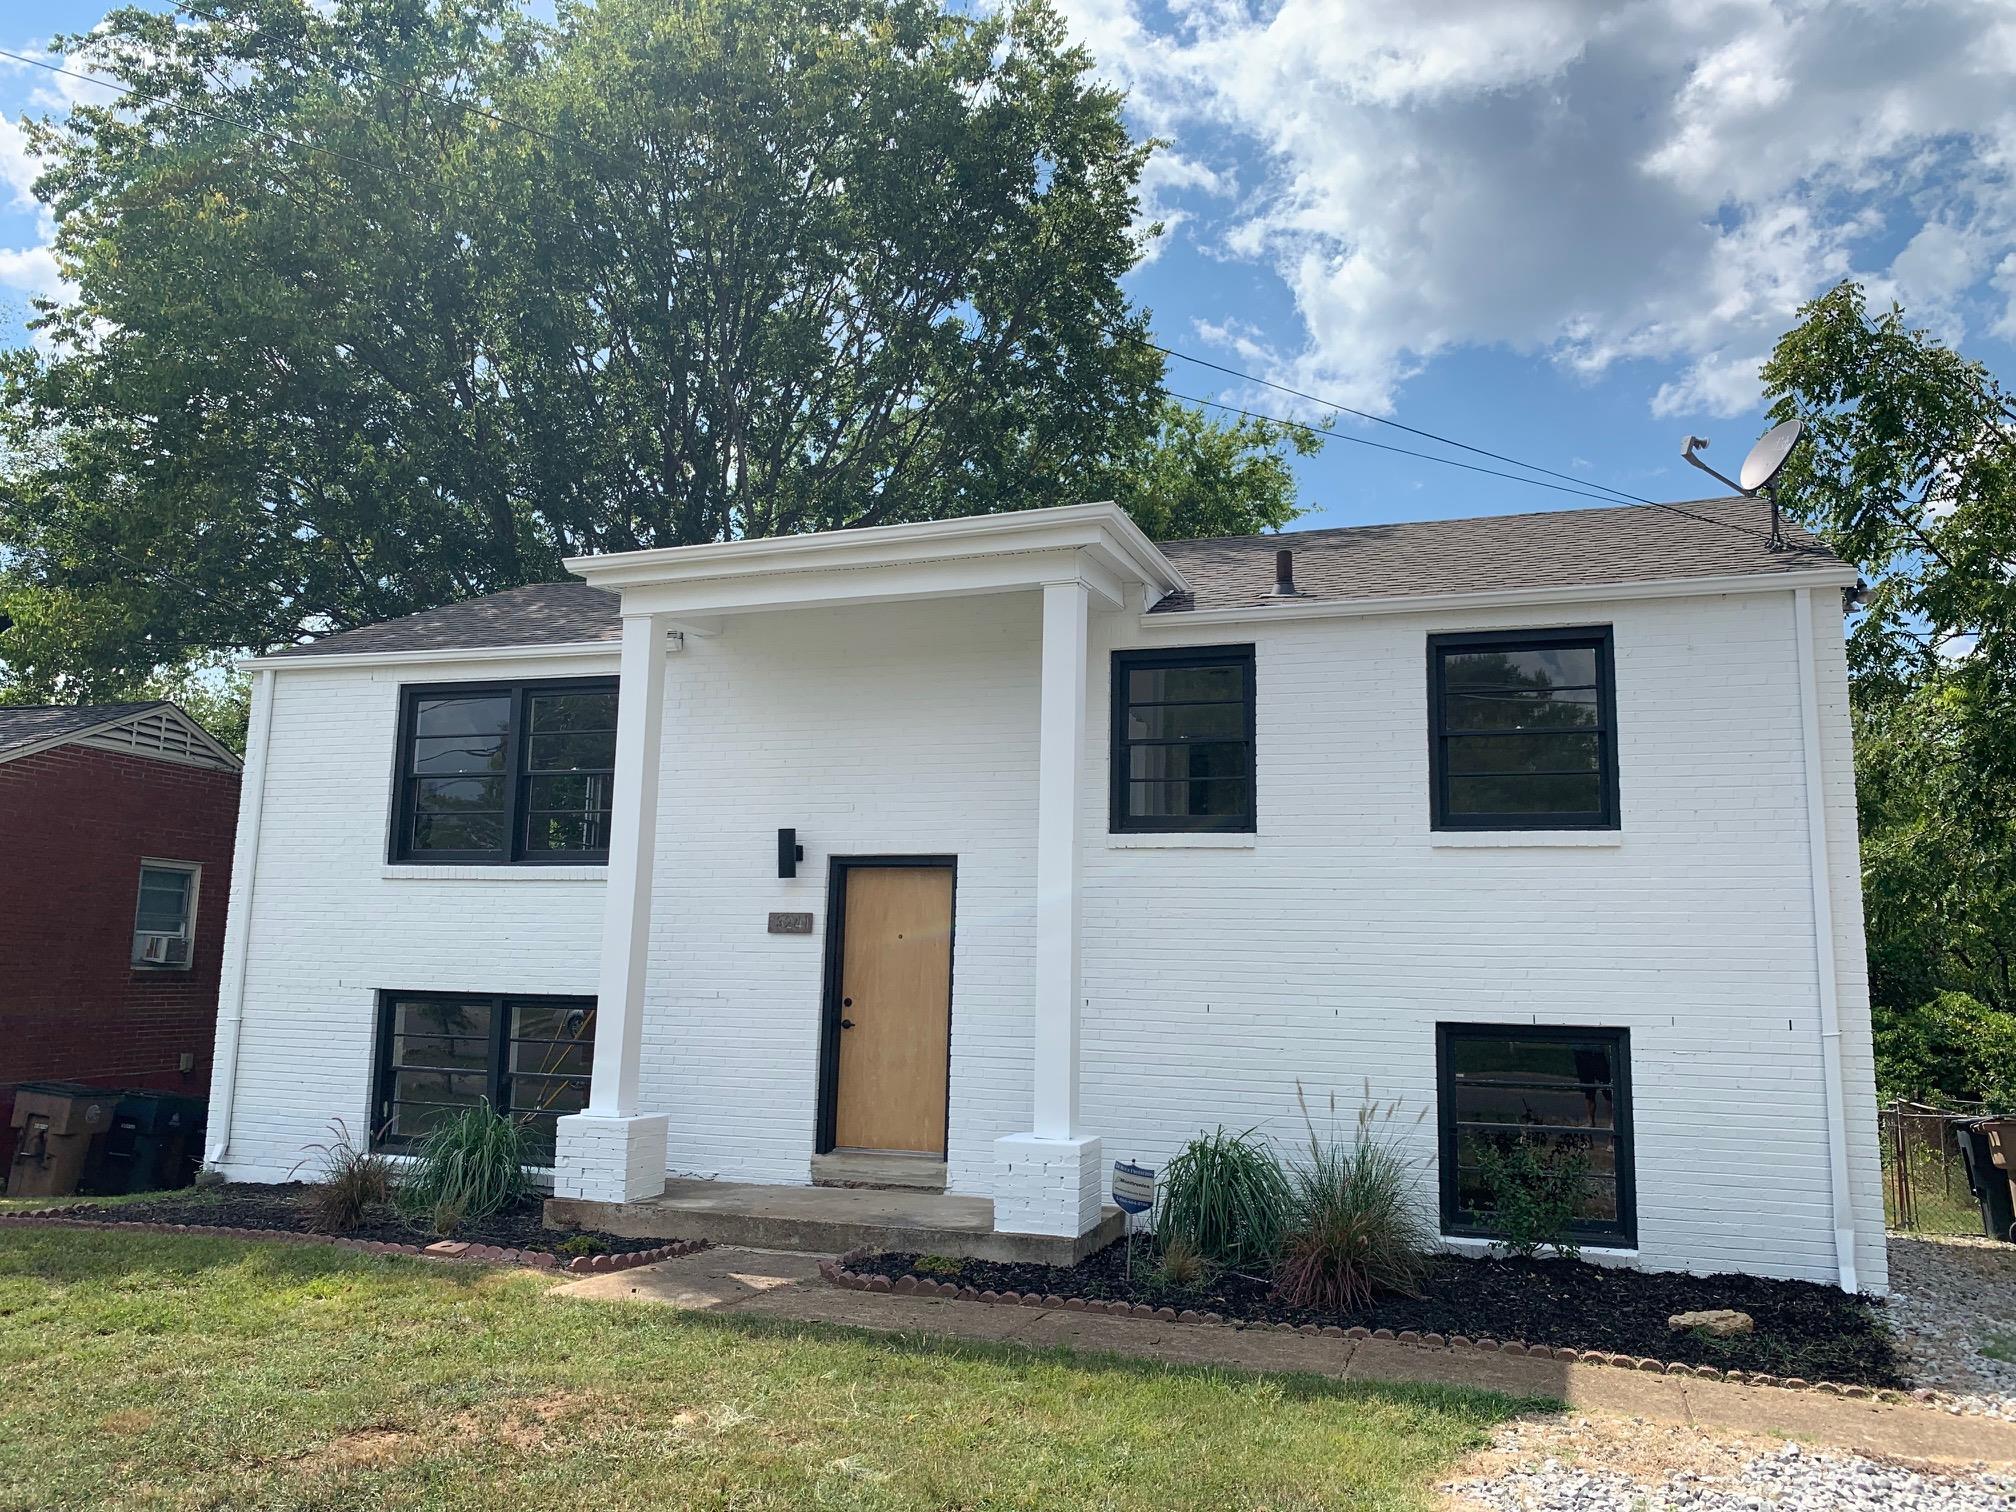 3241 Mayer Ln, Nashville, TN 37218 - Nashville, TN real estate listing